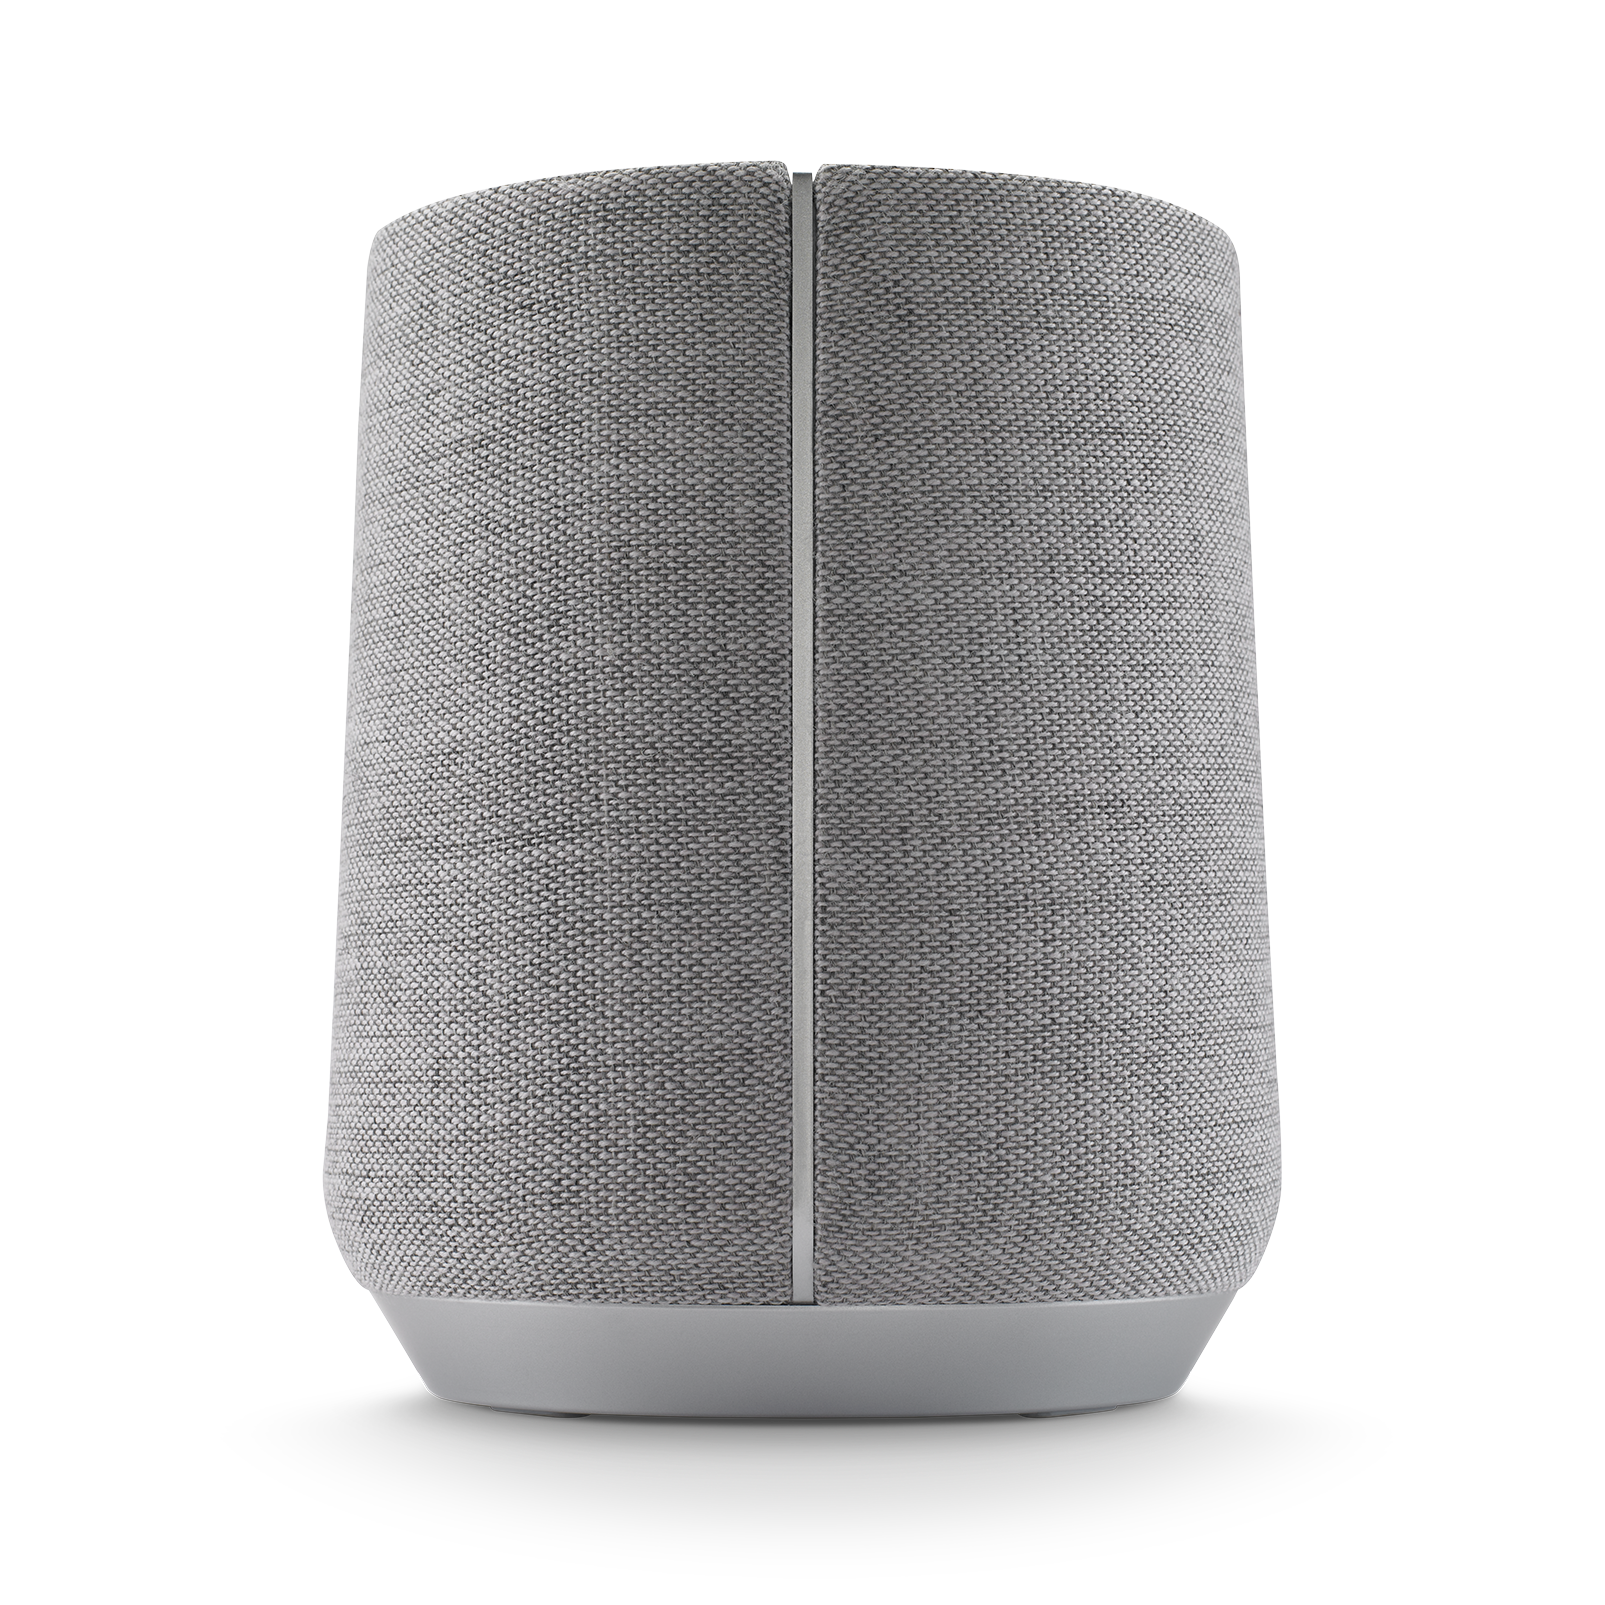 Harman Kardon Citation 300 - Grey - The medium-size smart home speaker with award winning design - Detailshot 3